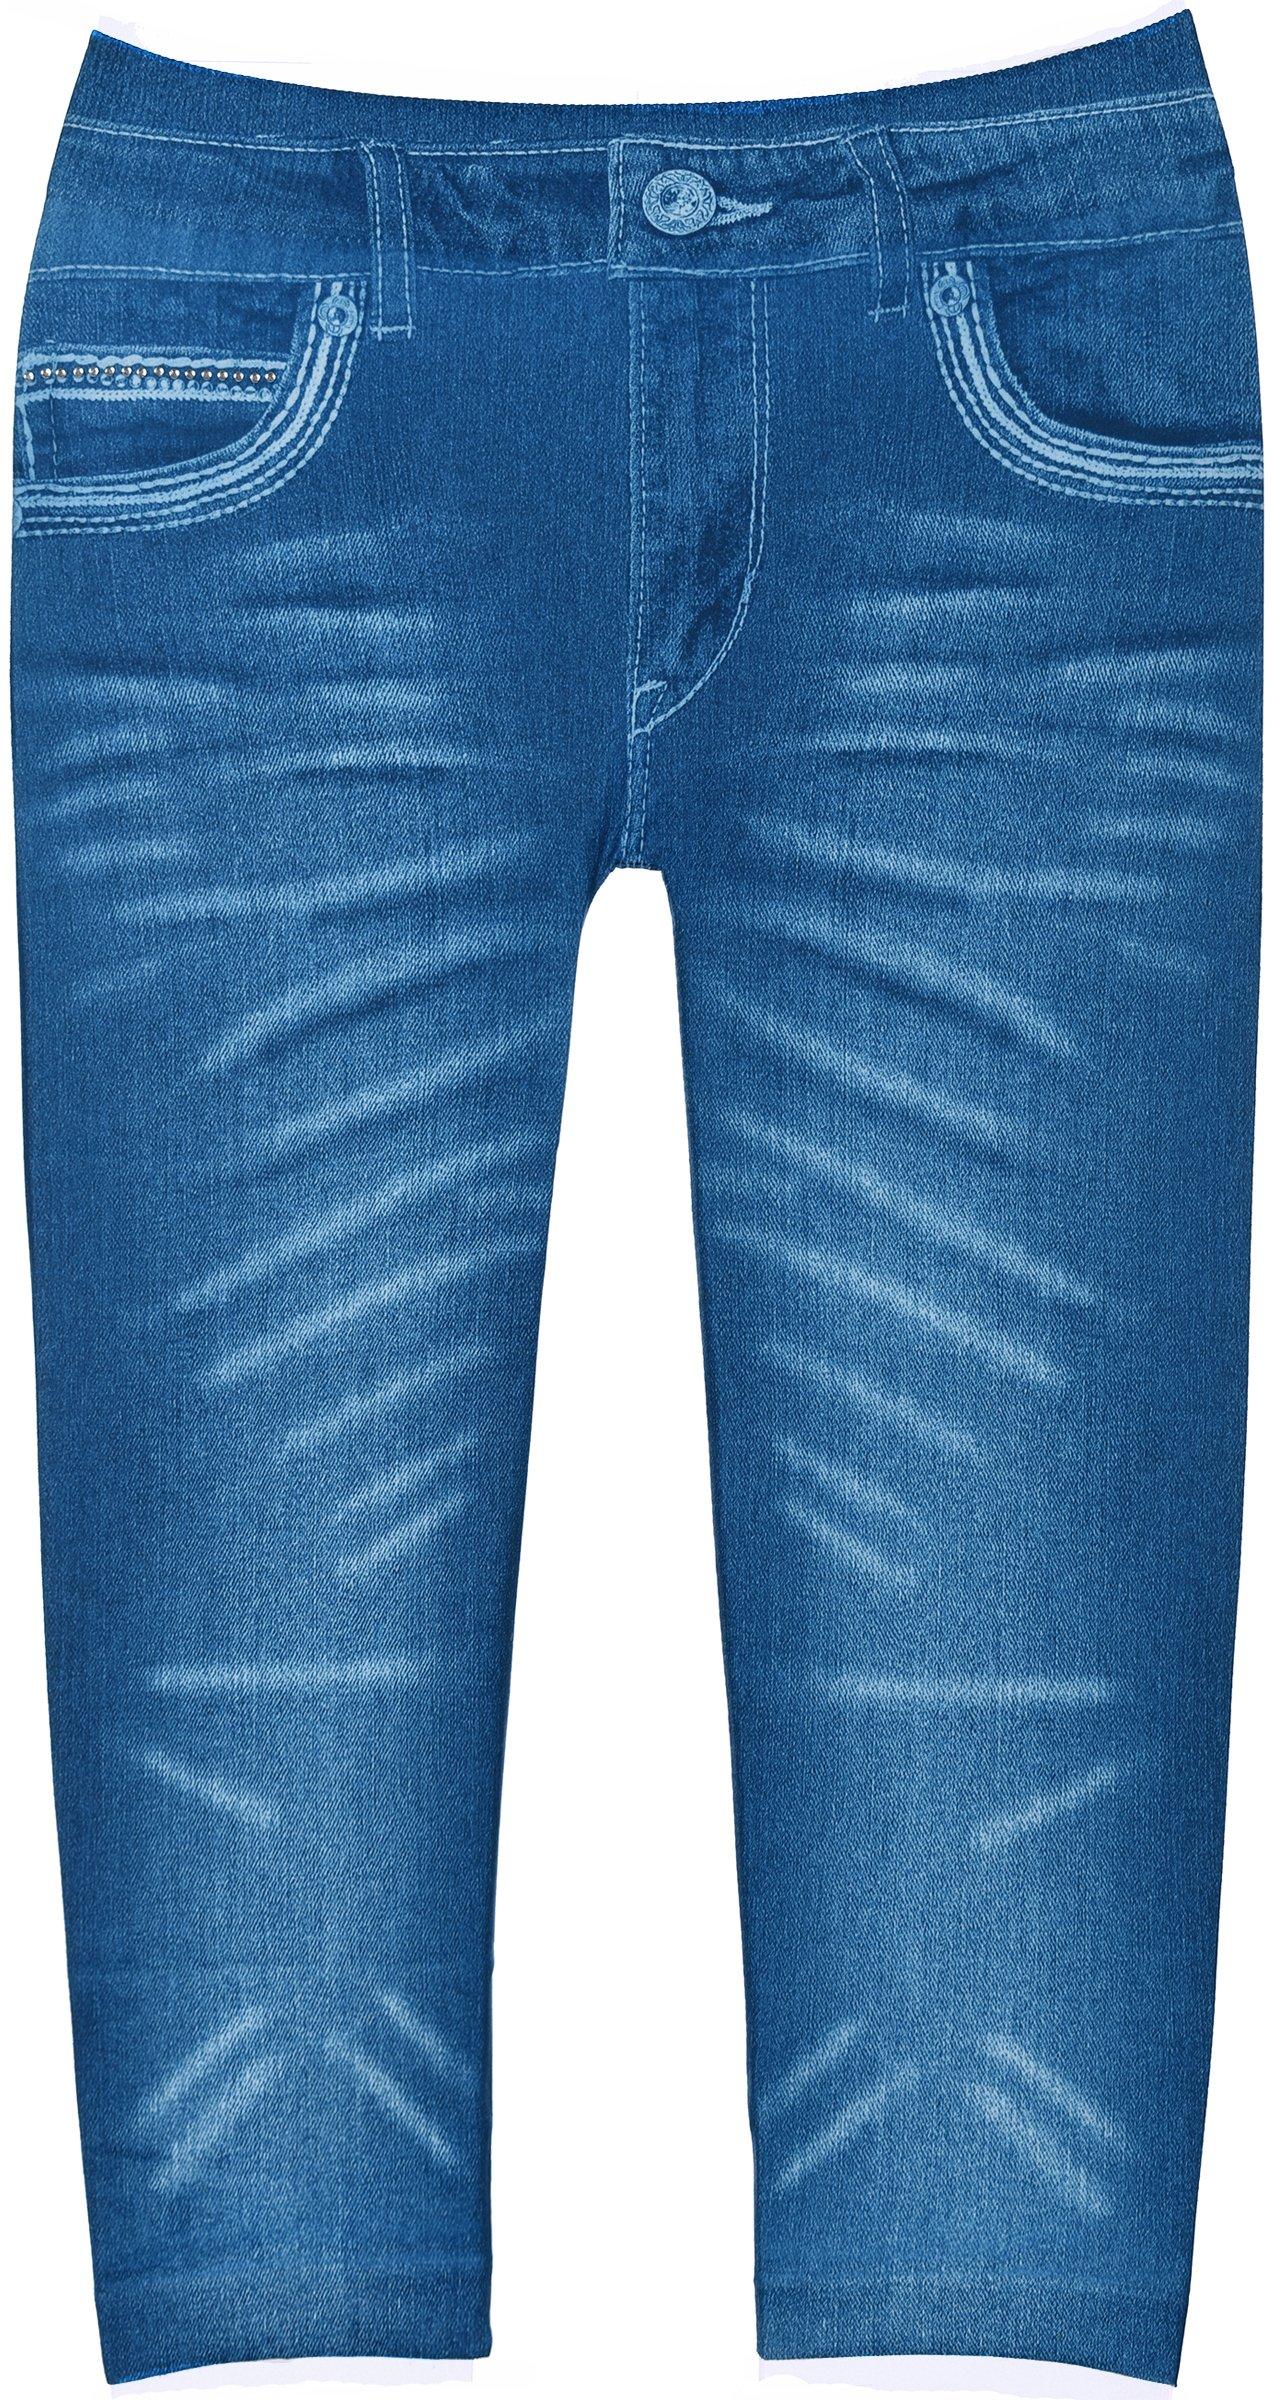 Crush Toddler Girls Blue Jean Print Leggings in 7 Fun Styles in Sizes 2T-4T (2T-4T, 22485 Blue)